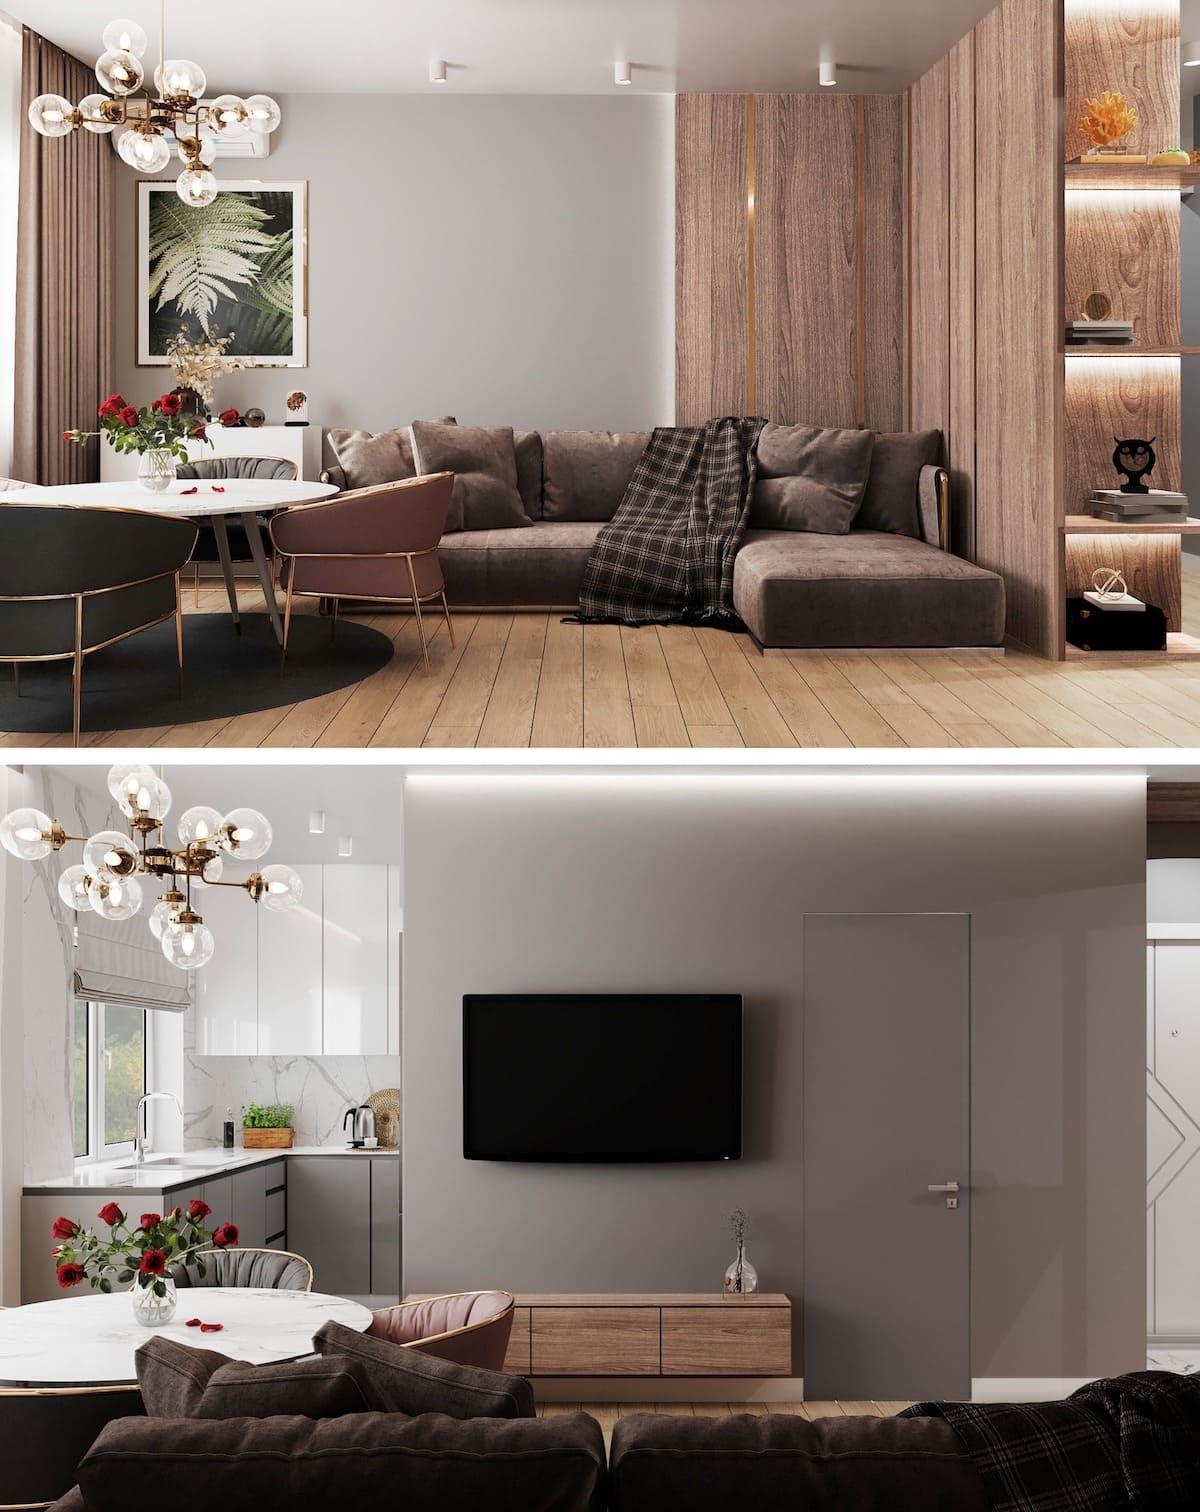 дизайн интерьера модной квартиры фото 100